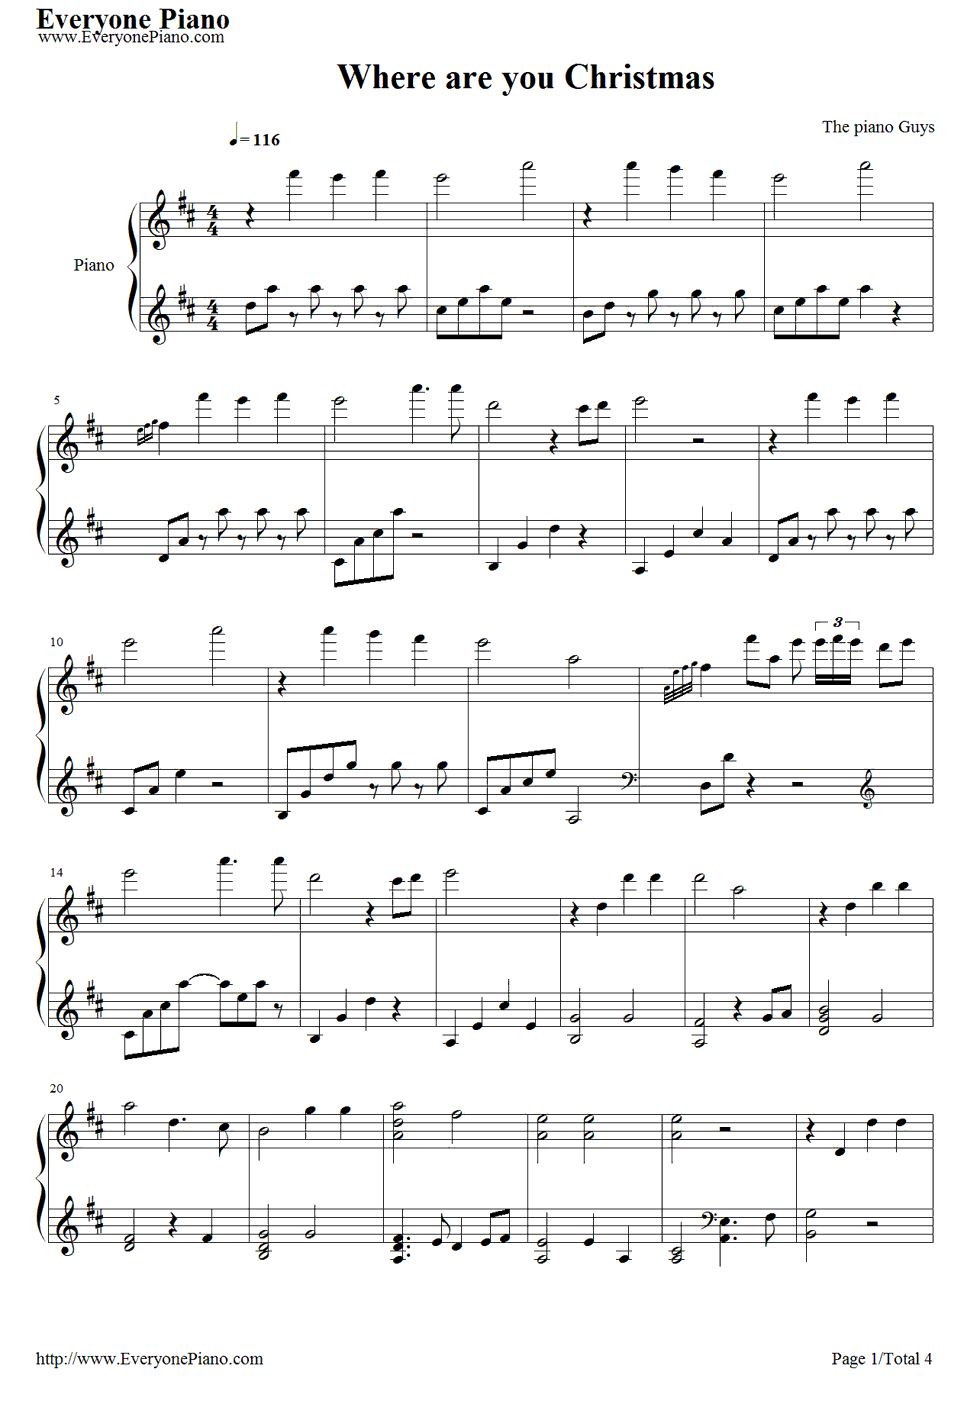 Free Where Are You Christmas-The Piano Guys Sheet Music Preview 1 - Free Christmas Sheet Music For Keyboard Printable